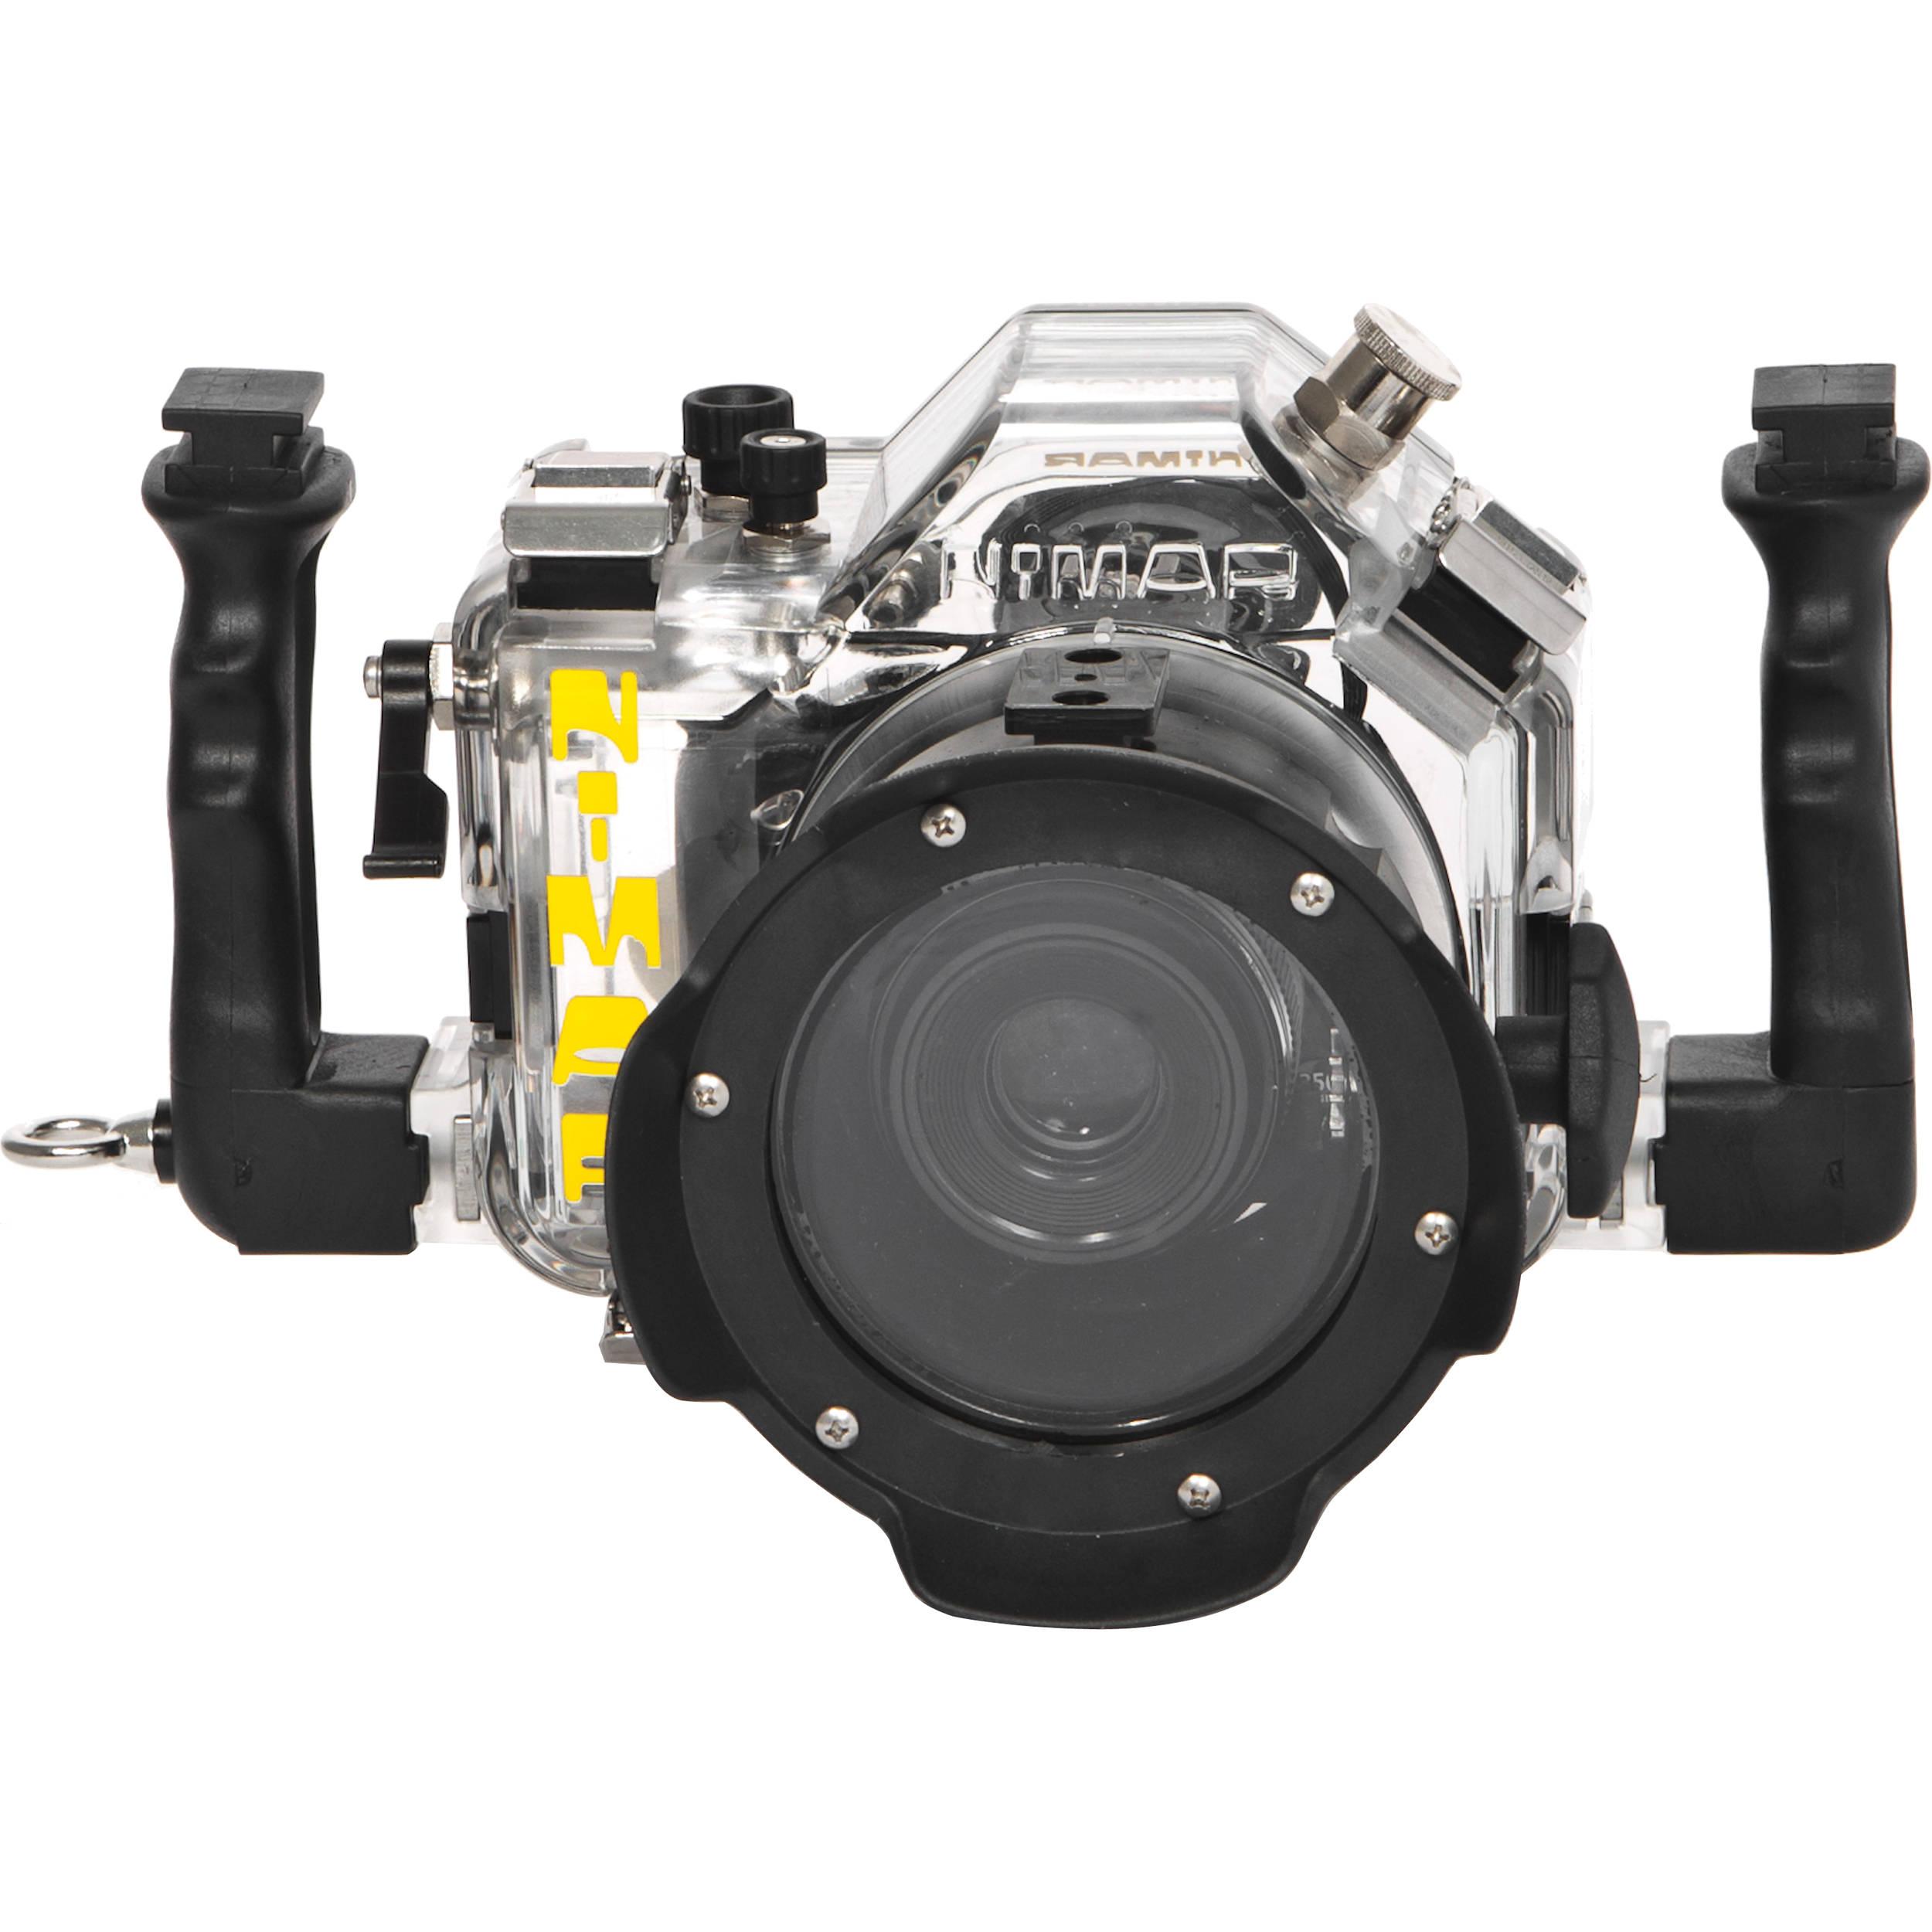 nimar underwater housing for canon eos rebel 300d ni3dc300zmq rh bhphotovideo com Canon EOS Rebel XS 1000D Canon EOS Digital Rebel XT